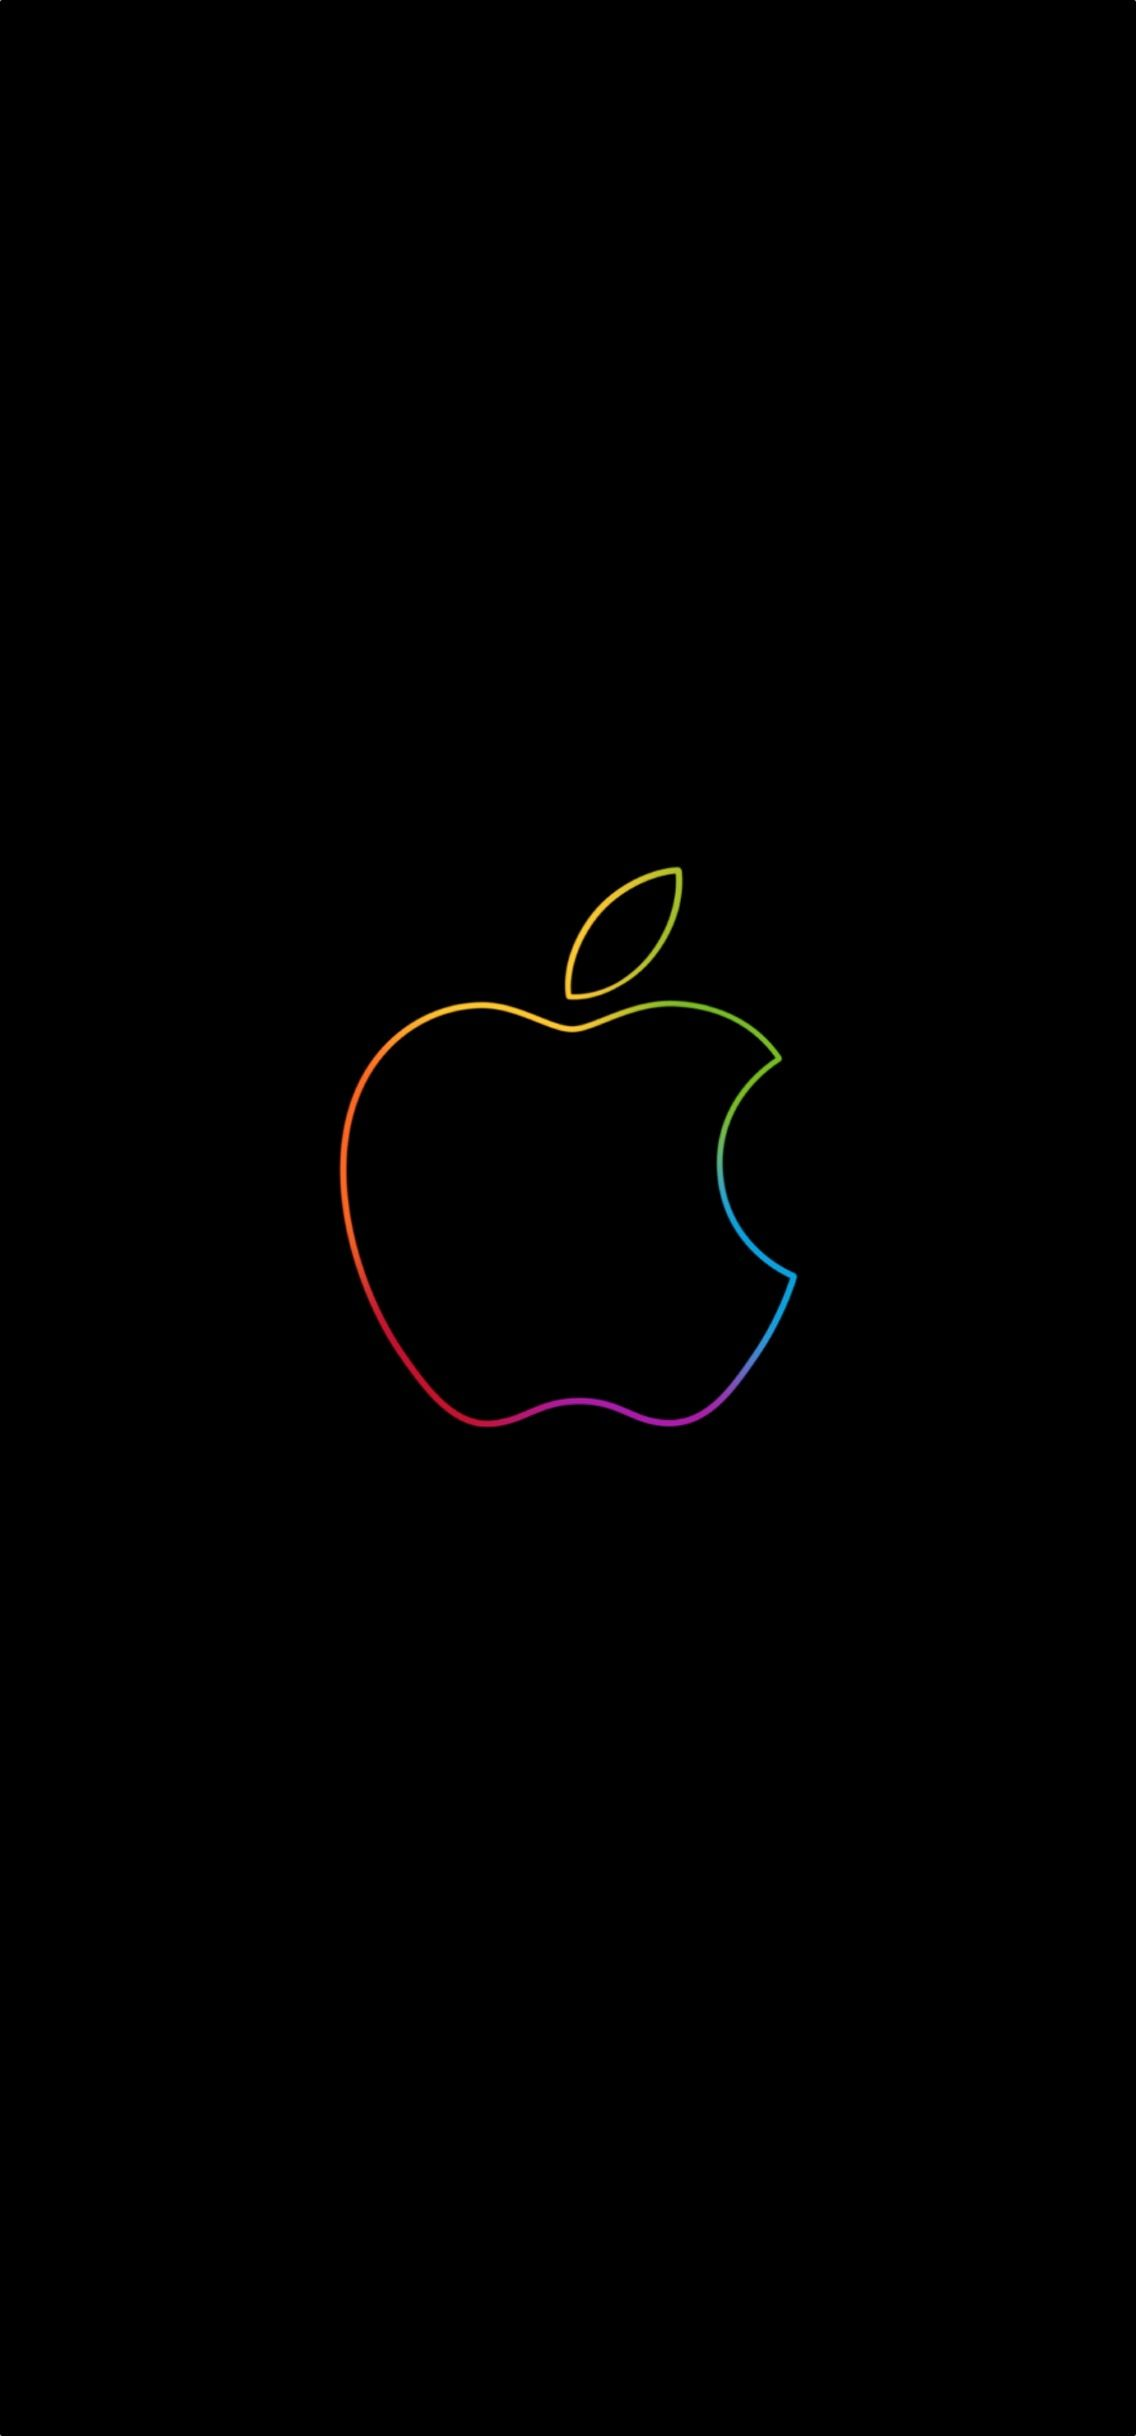 Iphone Xs Wallpaper Apple Logo Ipcwallpapers Apple Logo Wallpaper Iphone Apple Logo Wallpaper Apple Iphone Wallpaper Hd